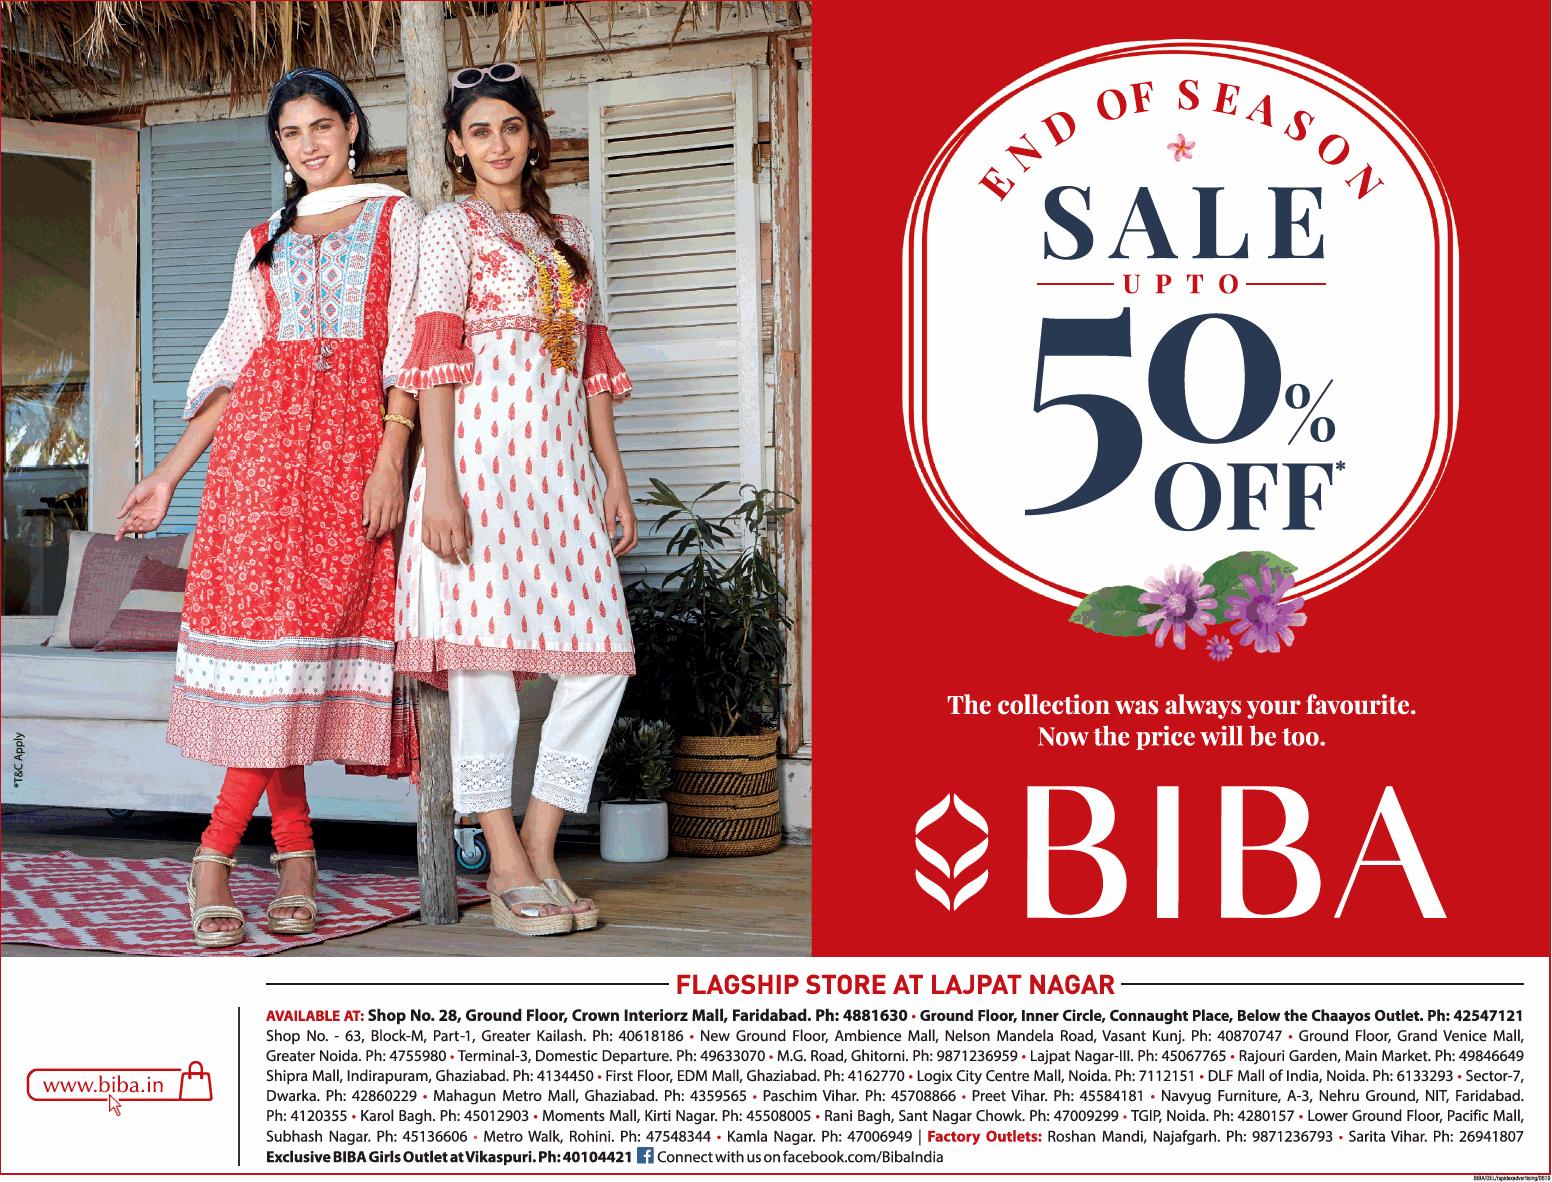 biba-clothing-end-of-season-sale-upto-50%-off-ad-delhi-times-21-06-2019.png